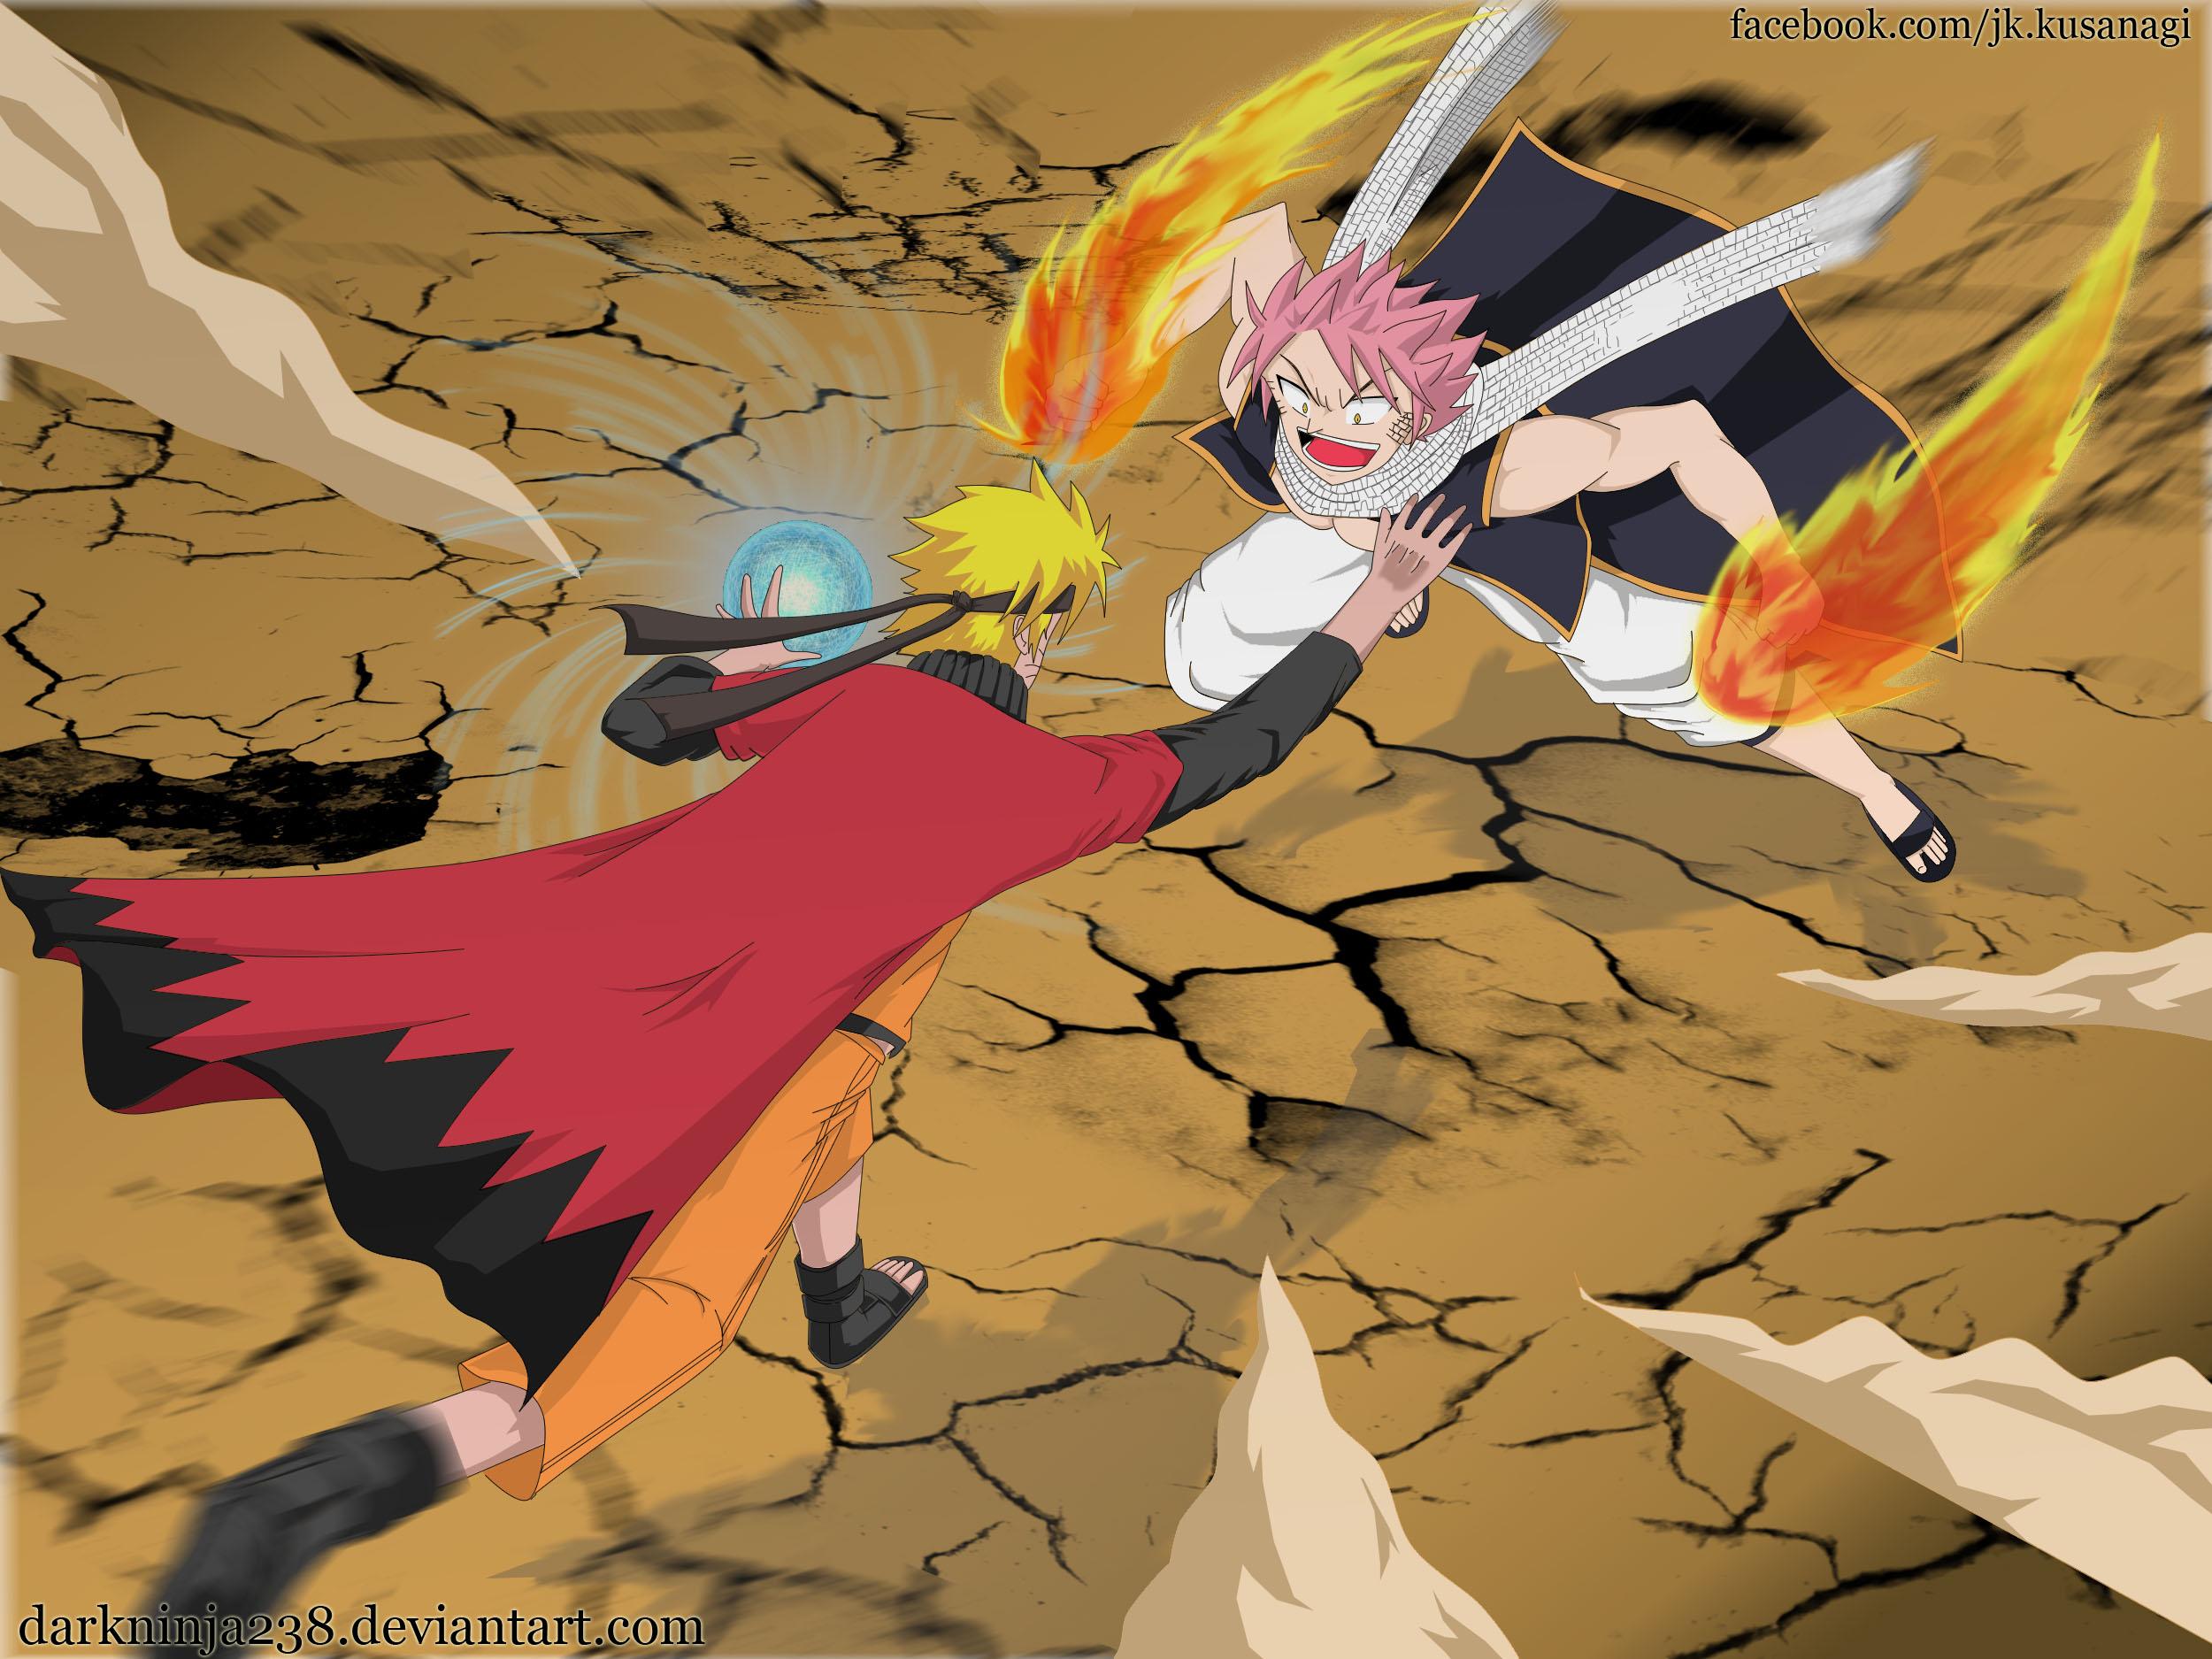 Naruto VS Natsu by darkninja238